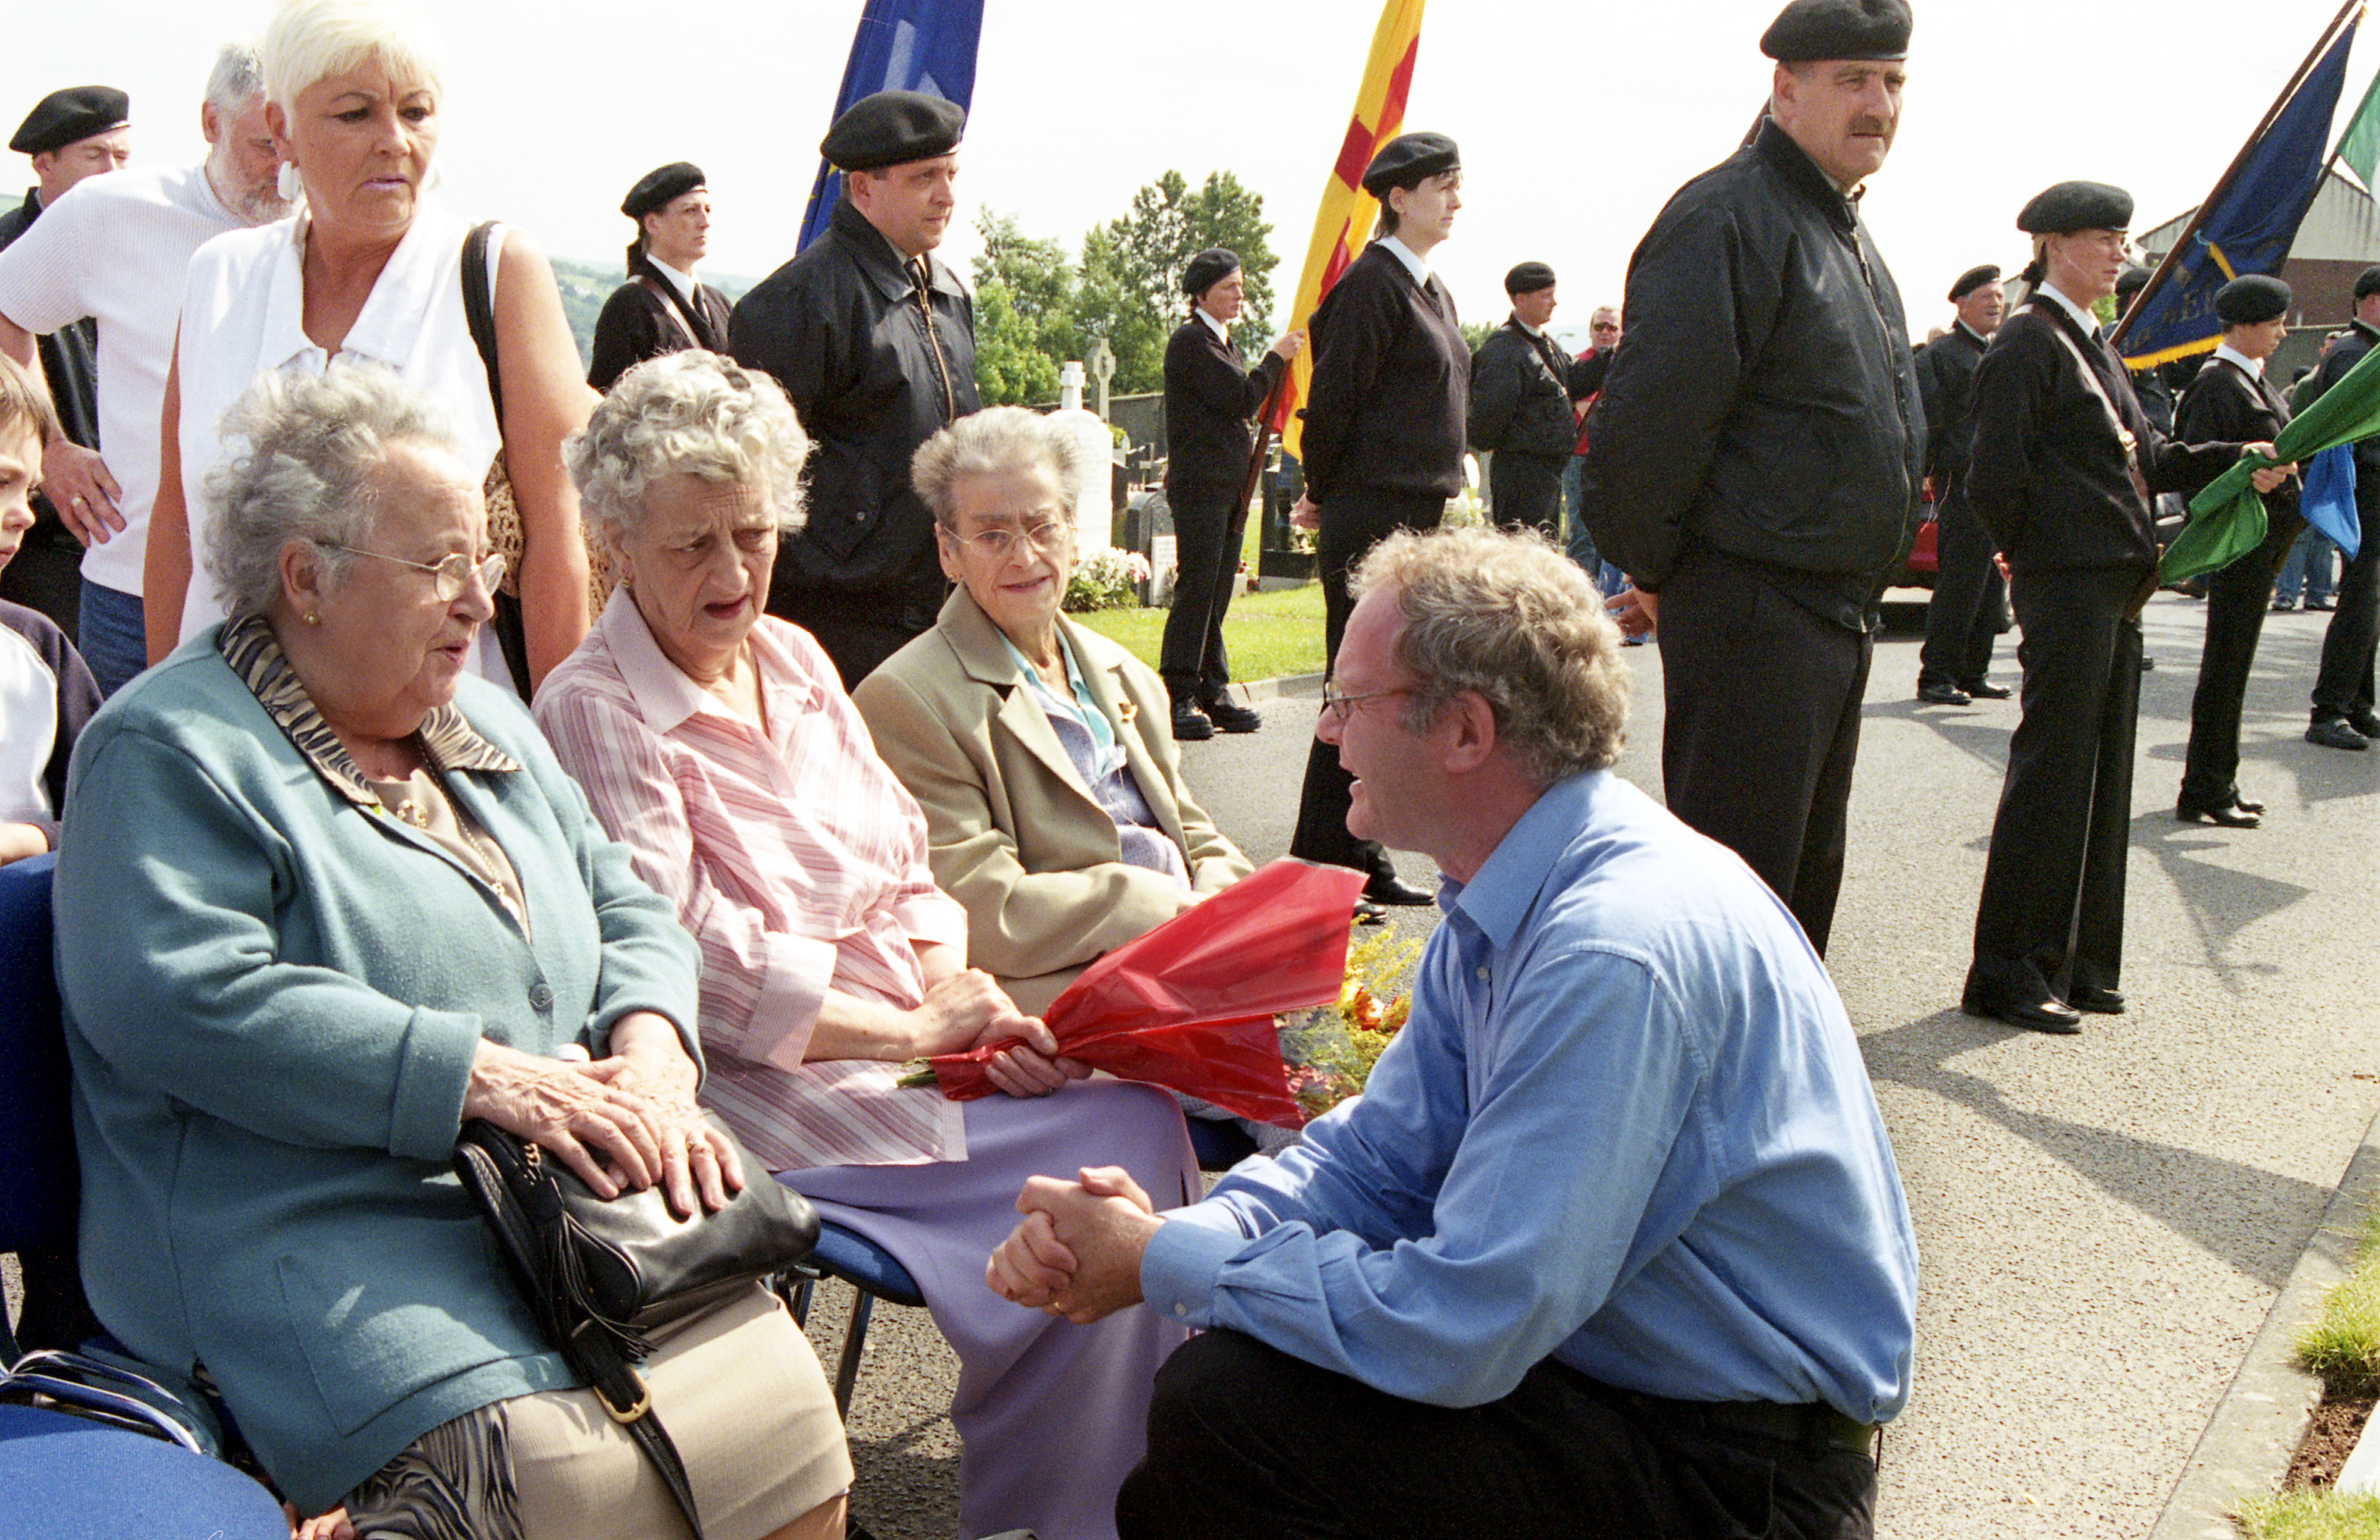 Martin-McGuinness-and-IRA-mens-relatives